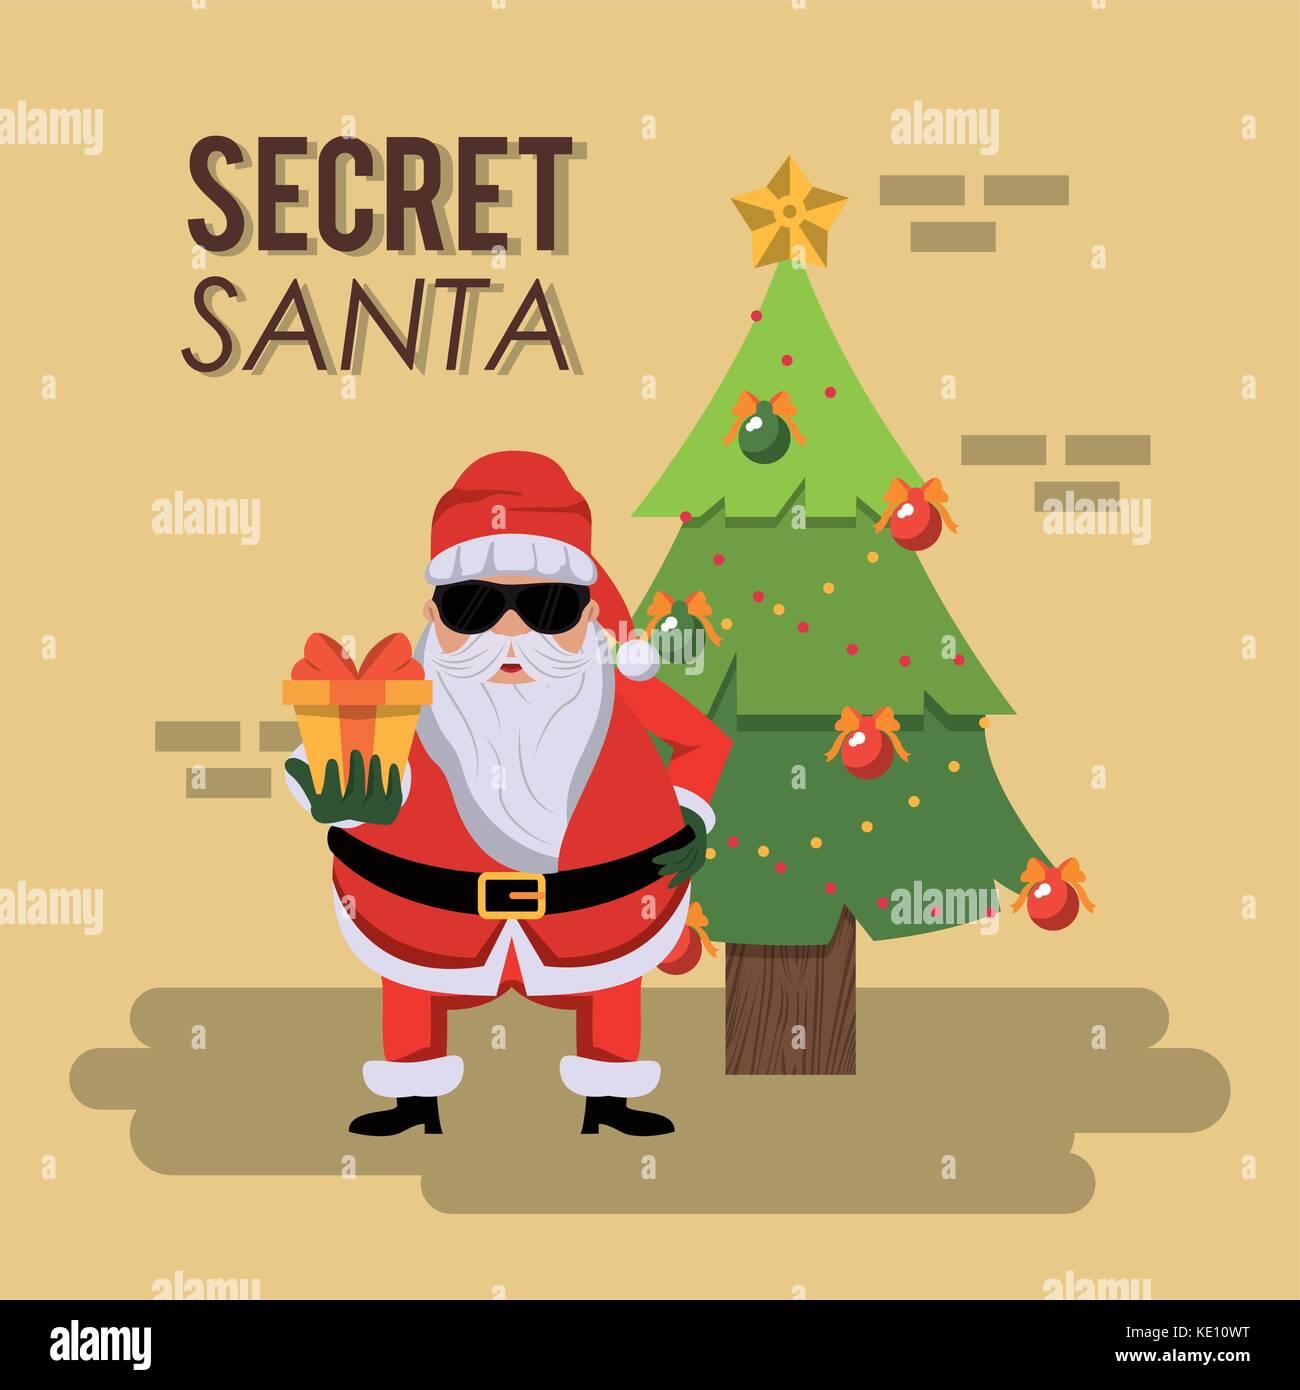 Secret santa stock vector images alamy secret santa cartoon m4hsunfo